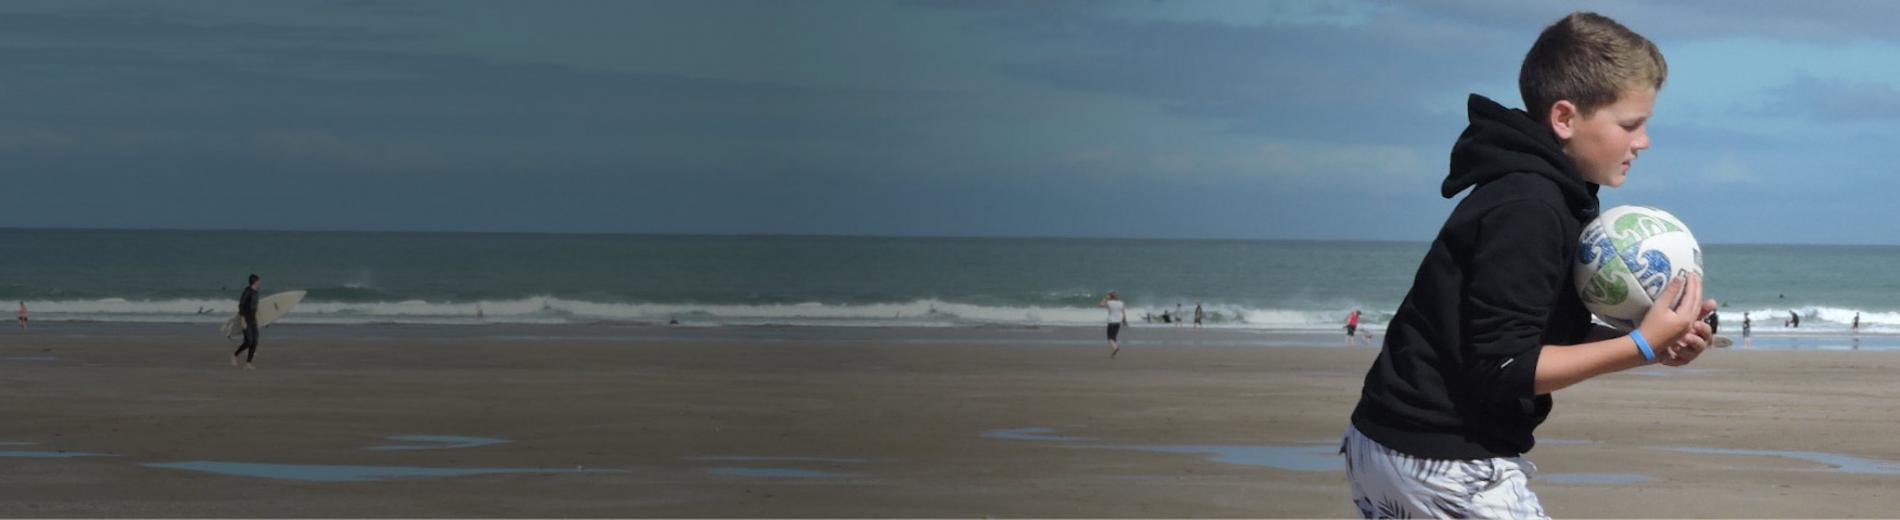 Beach Rugby on Woolacombe Beach